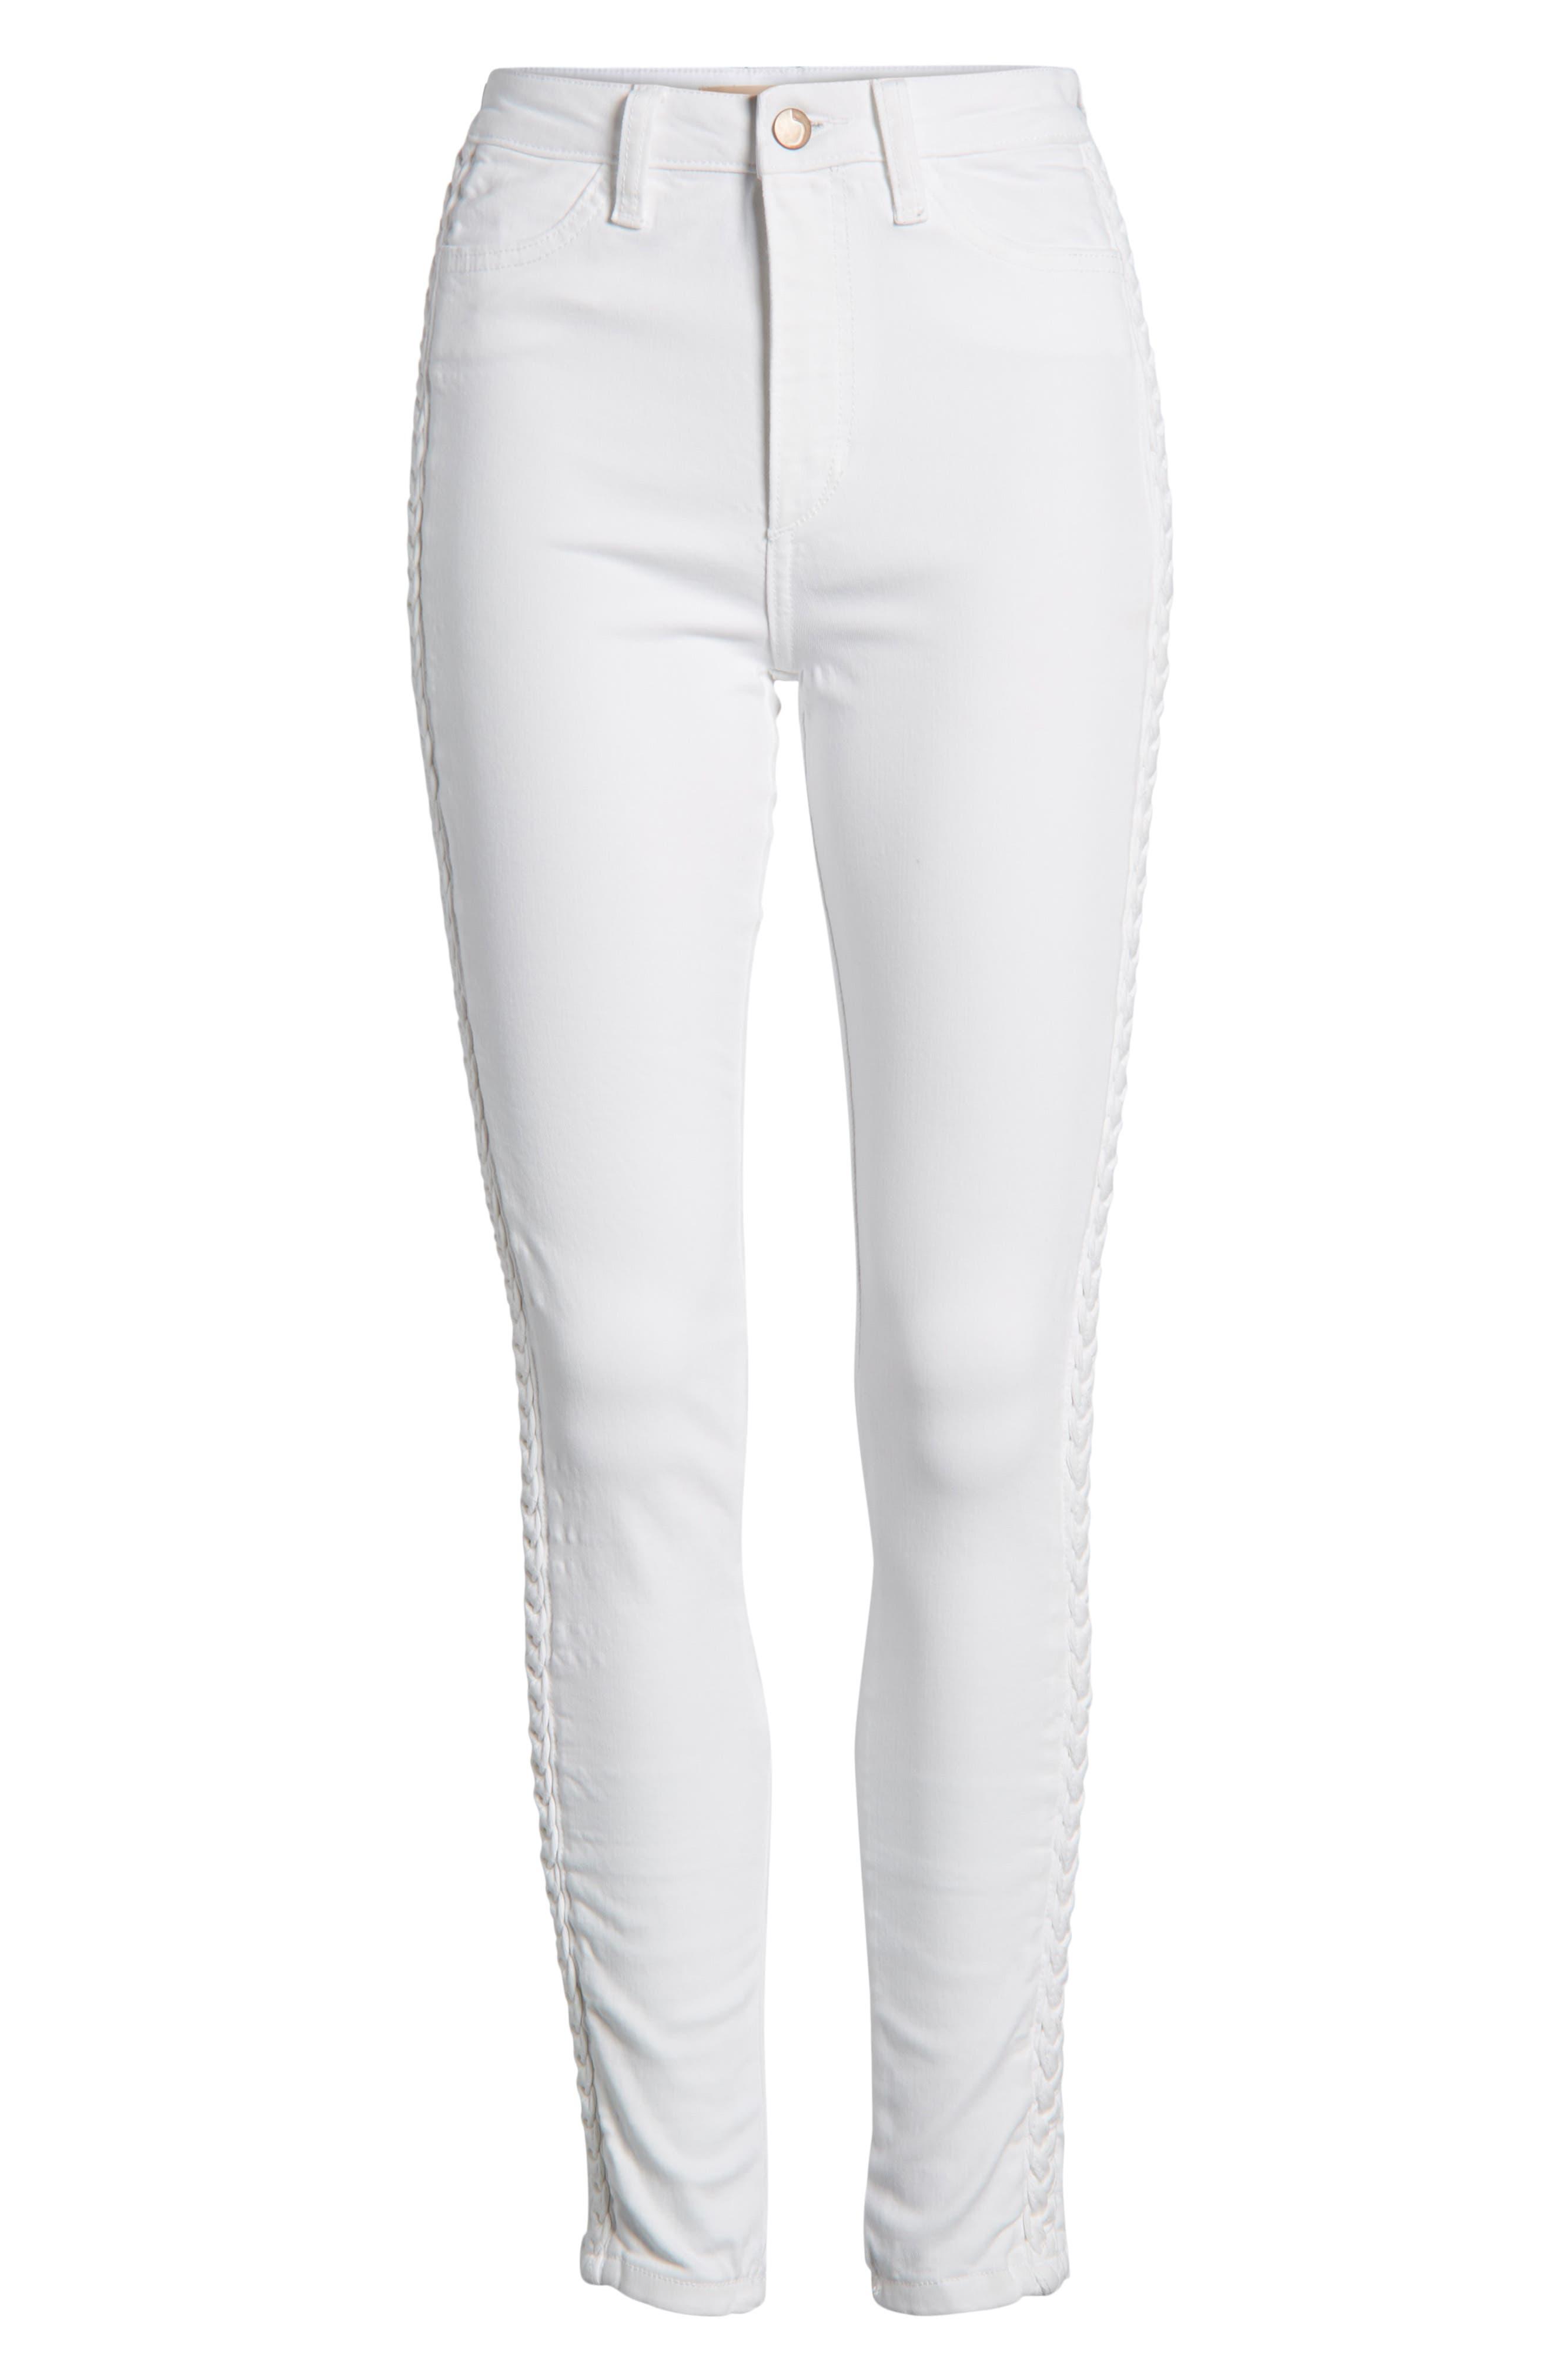 Charlie High Waist Skinny Jeans,                             Alternate thumbnail 7, color,                             PORSCHA